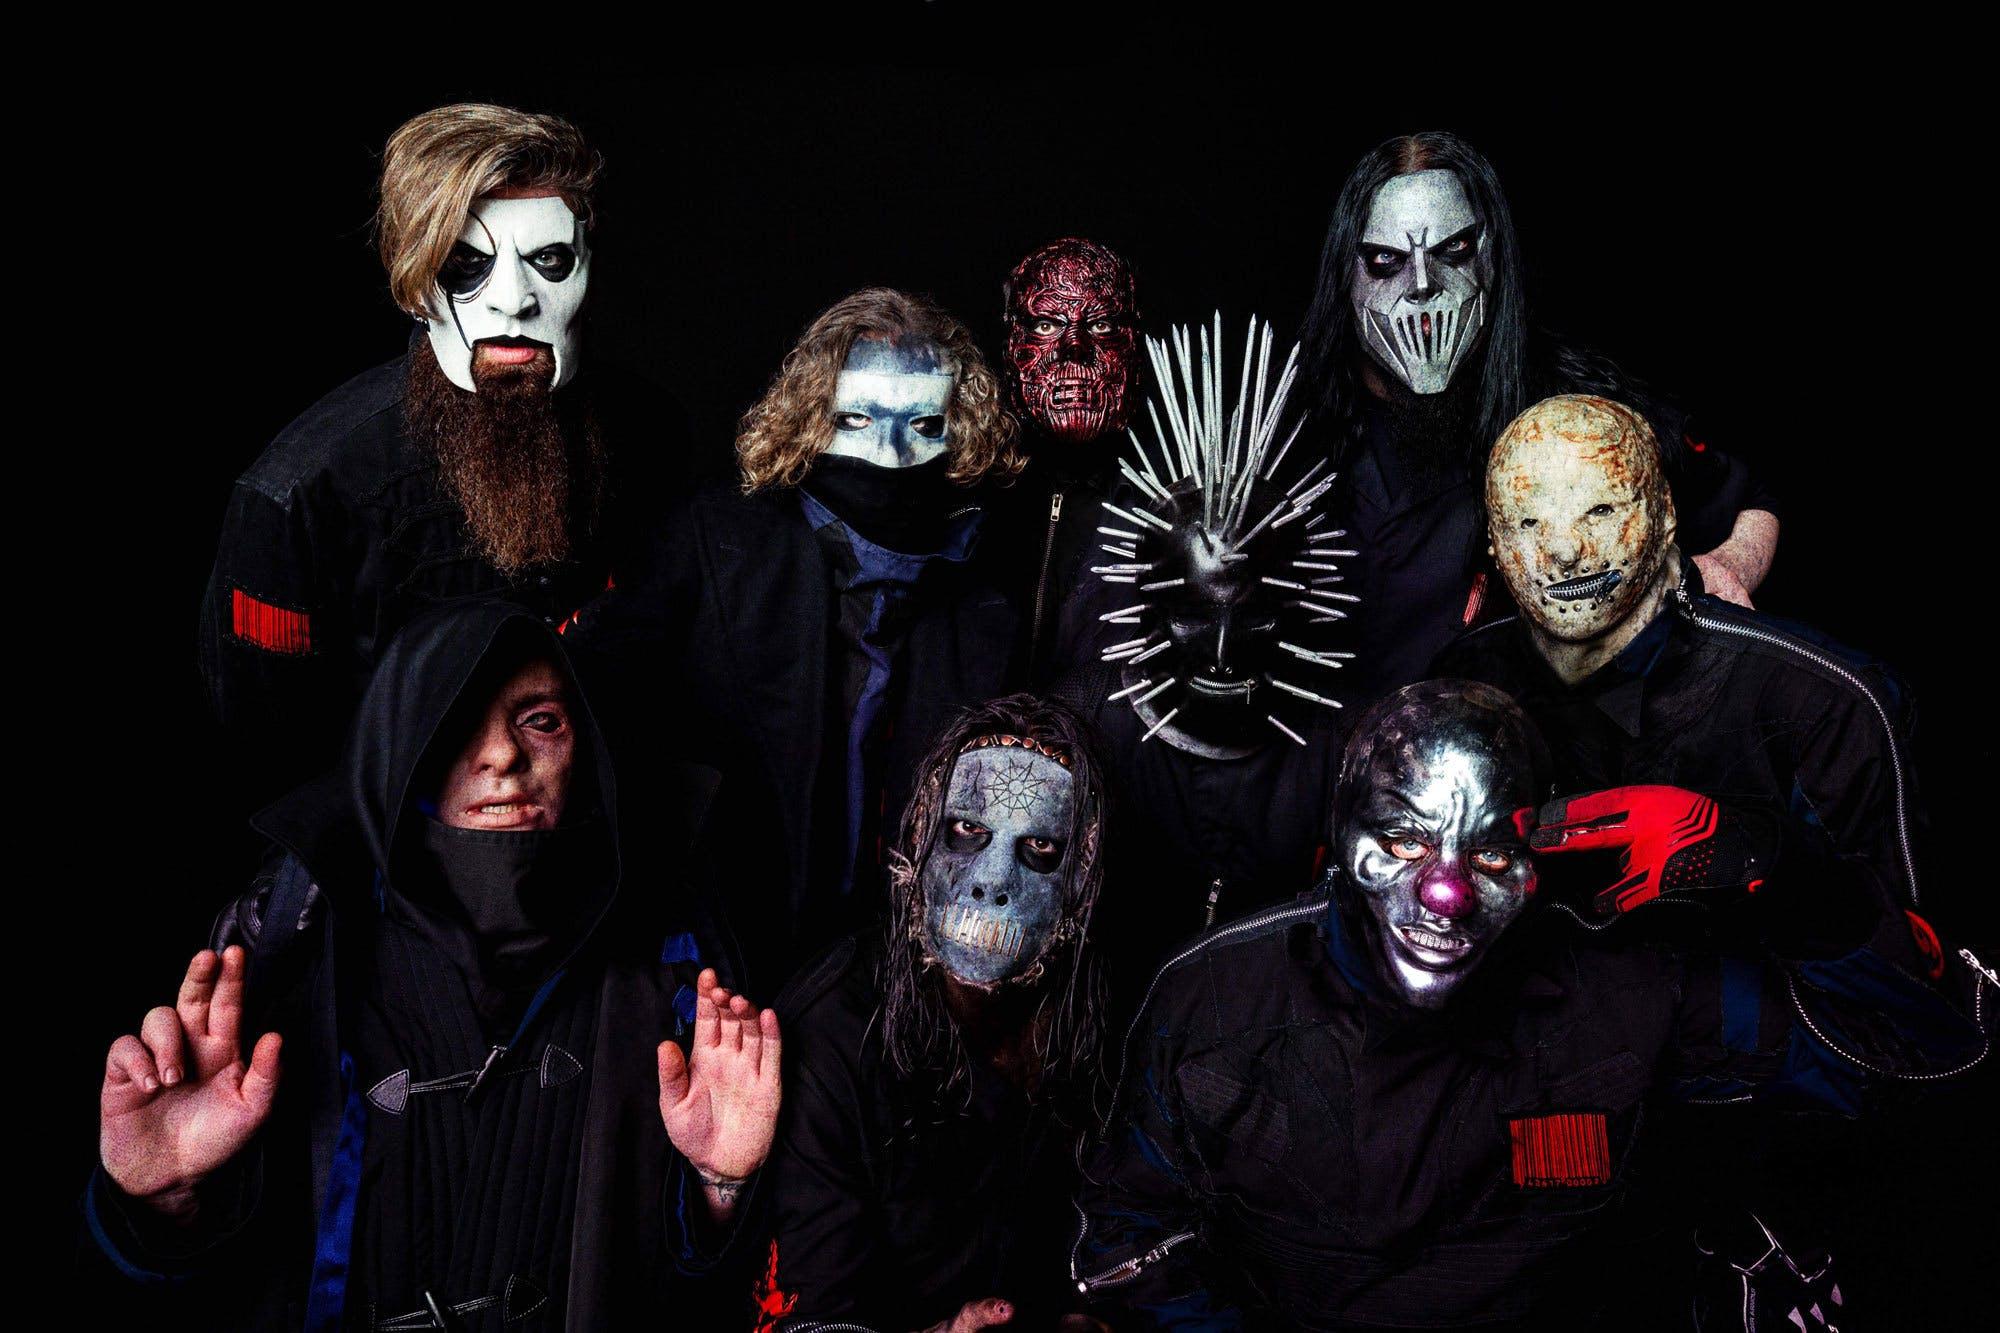 Slipknot-2019-smr-photocredit-Alexandria-Crahan-Conway